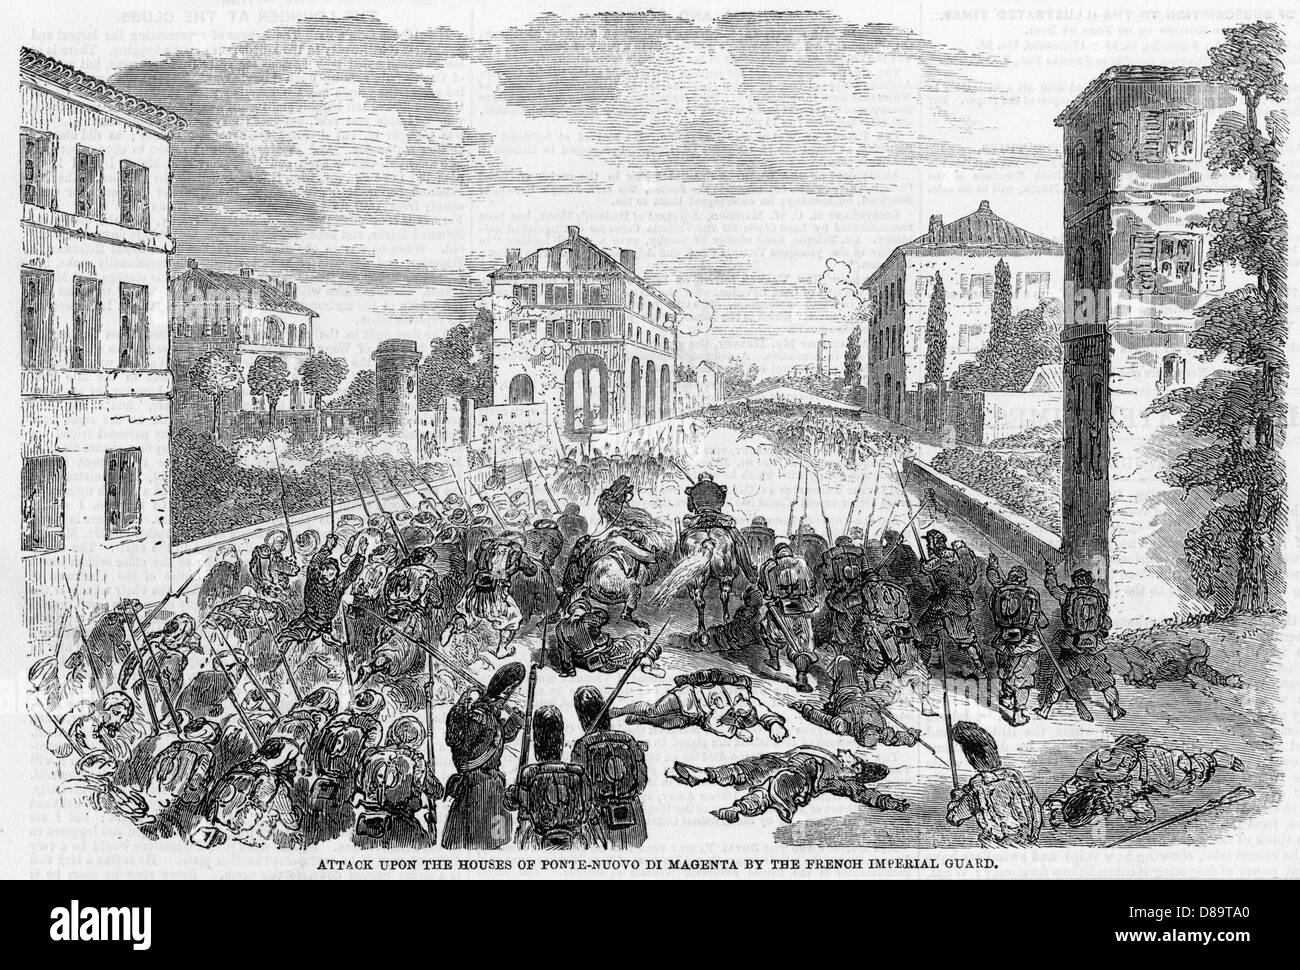 Battle Of Magenta 2 - Stock Image